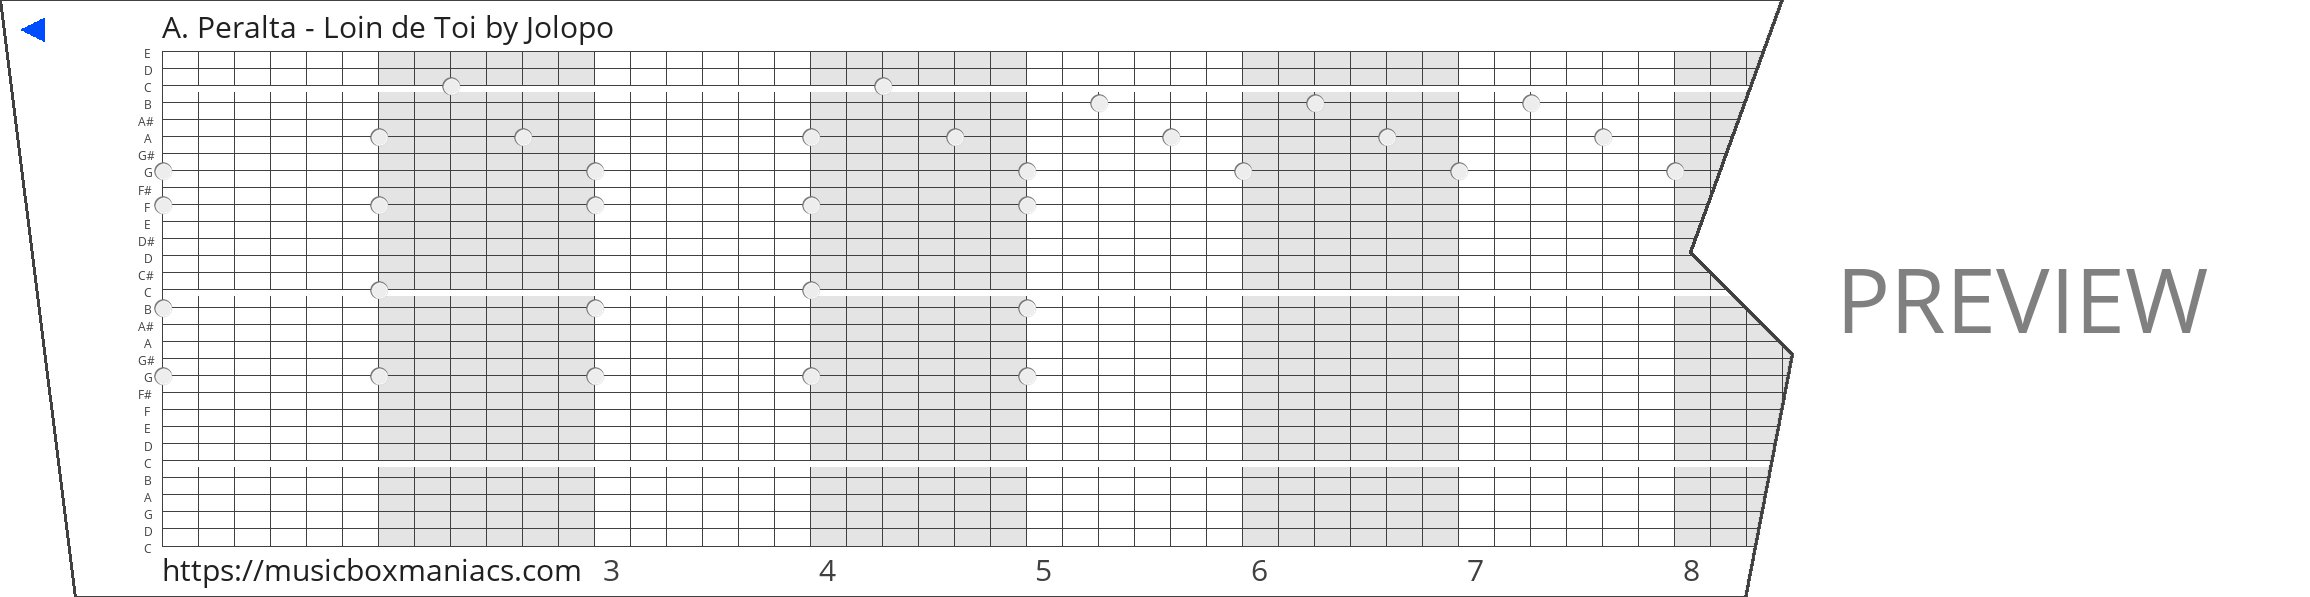 A. Peralta - Loin de Toi 30 note music box paper strip